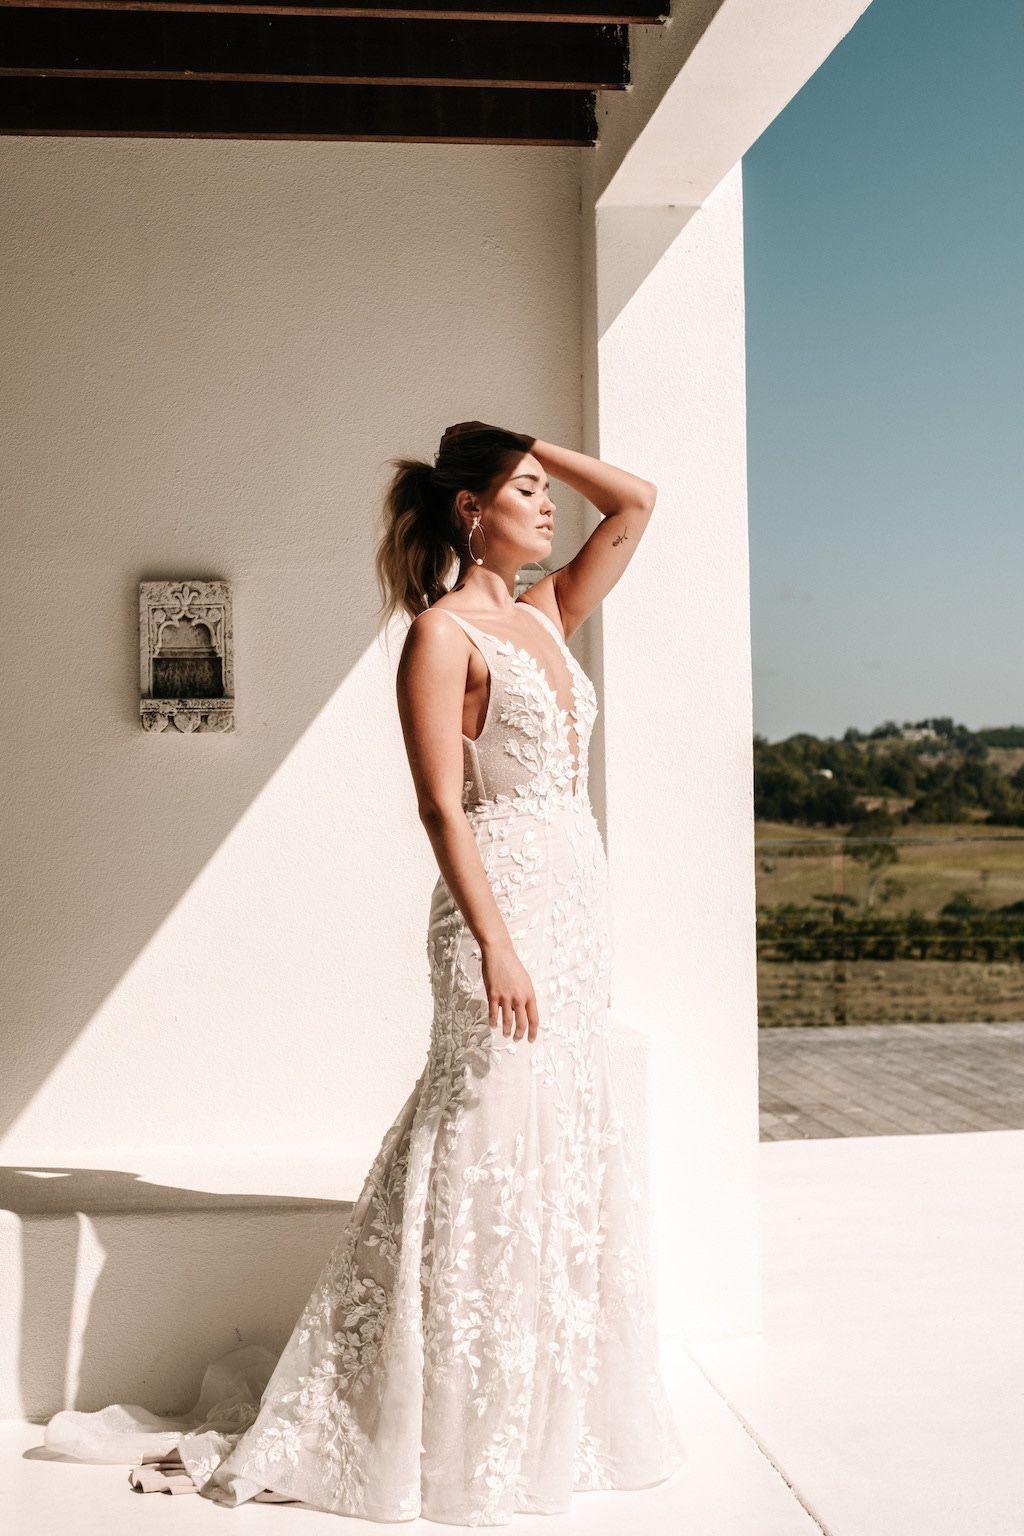 Mimi By Jane Hill Indie Wedding Dress Chic Wedding Gown Boho Wedding Dress Bohemian,Essense Of Australia Long Sleeve Wedding Dress